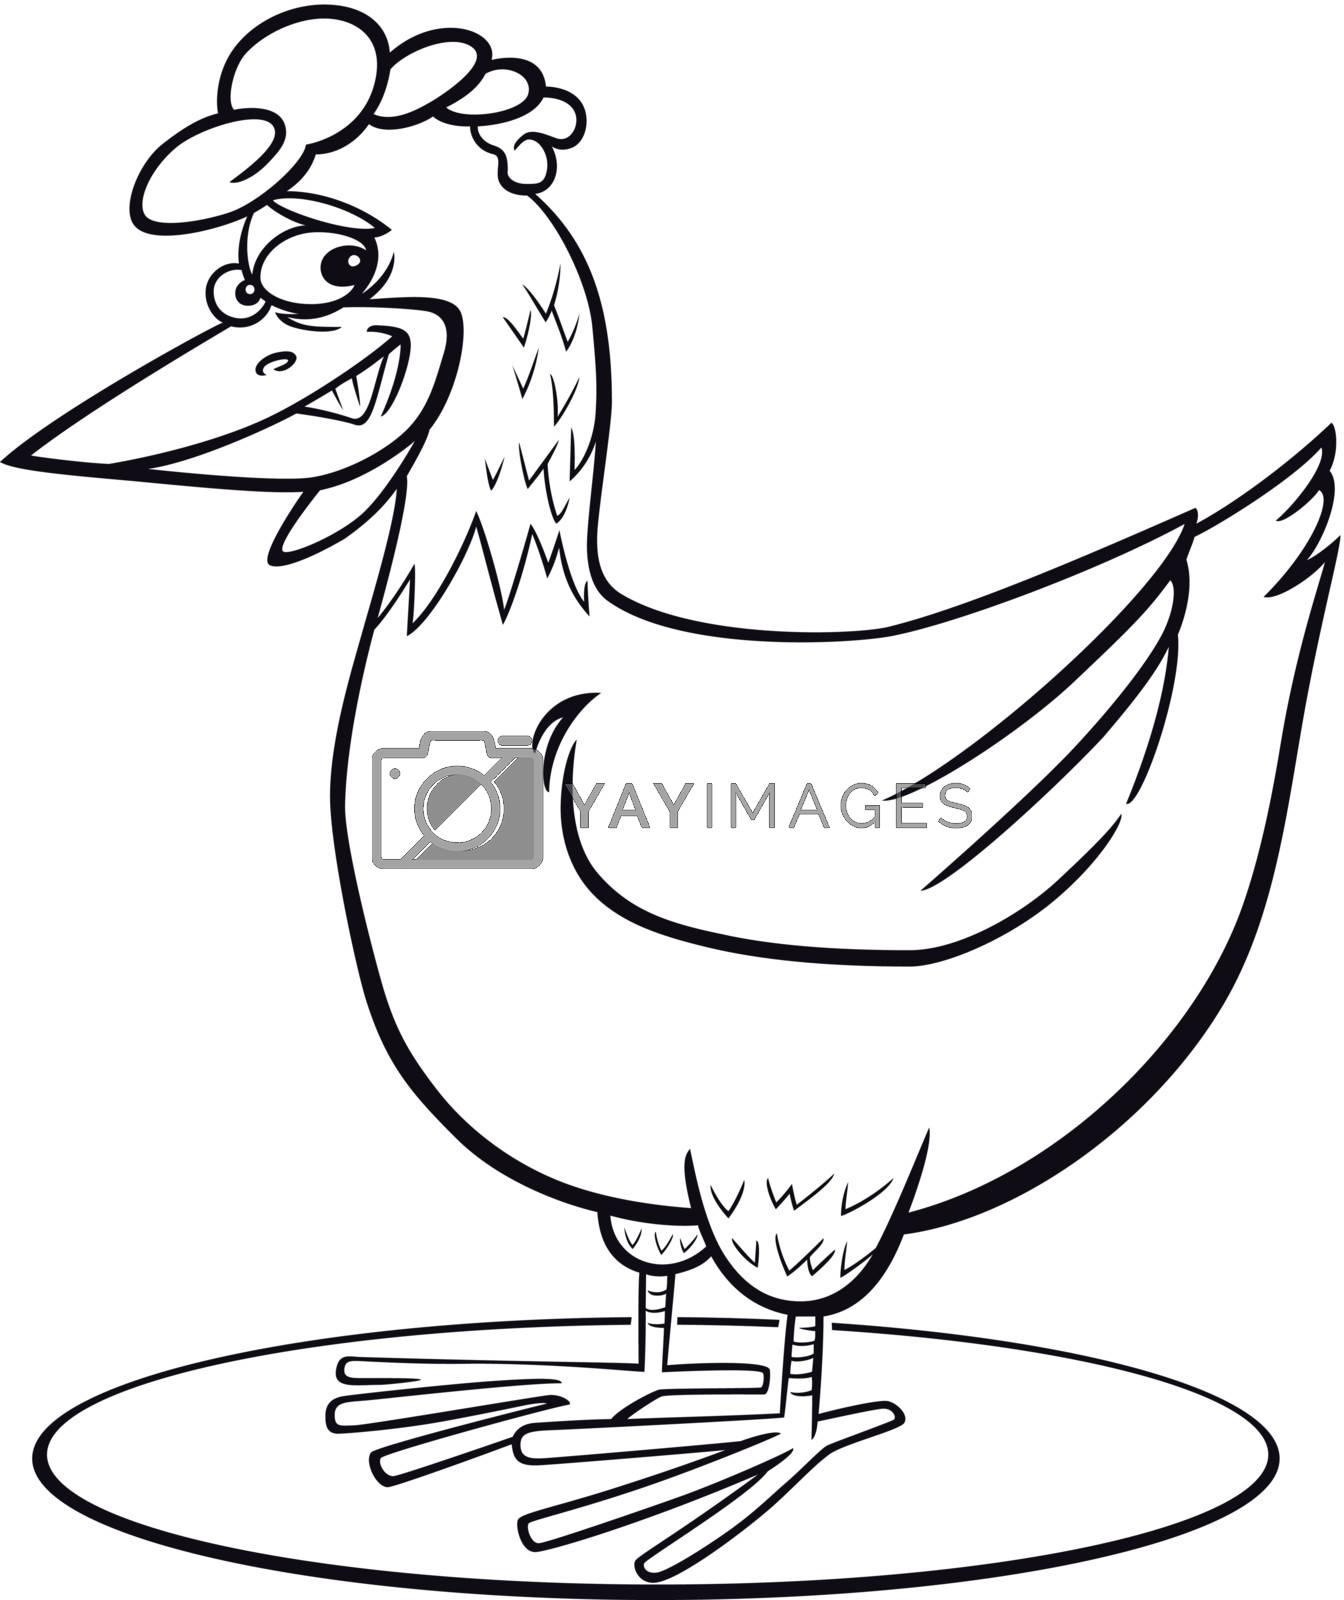 Cartoon hen coloring page by izakowski